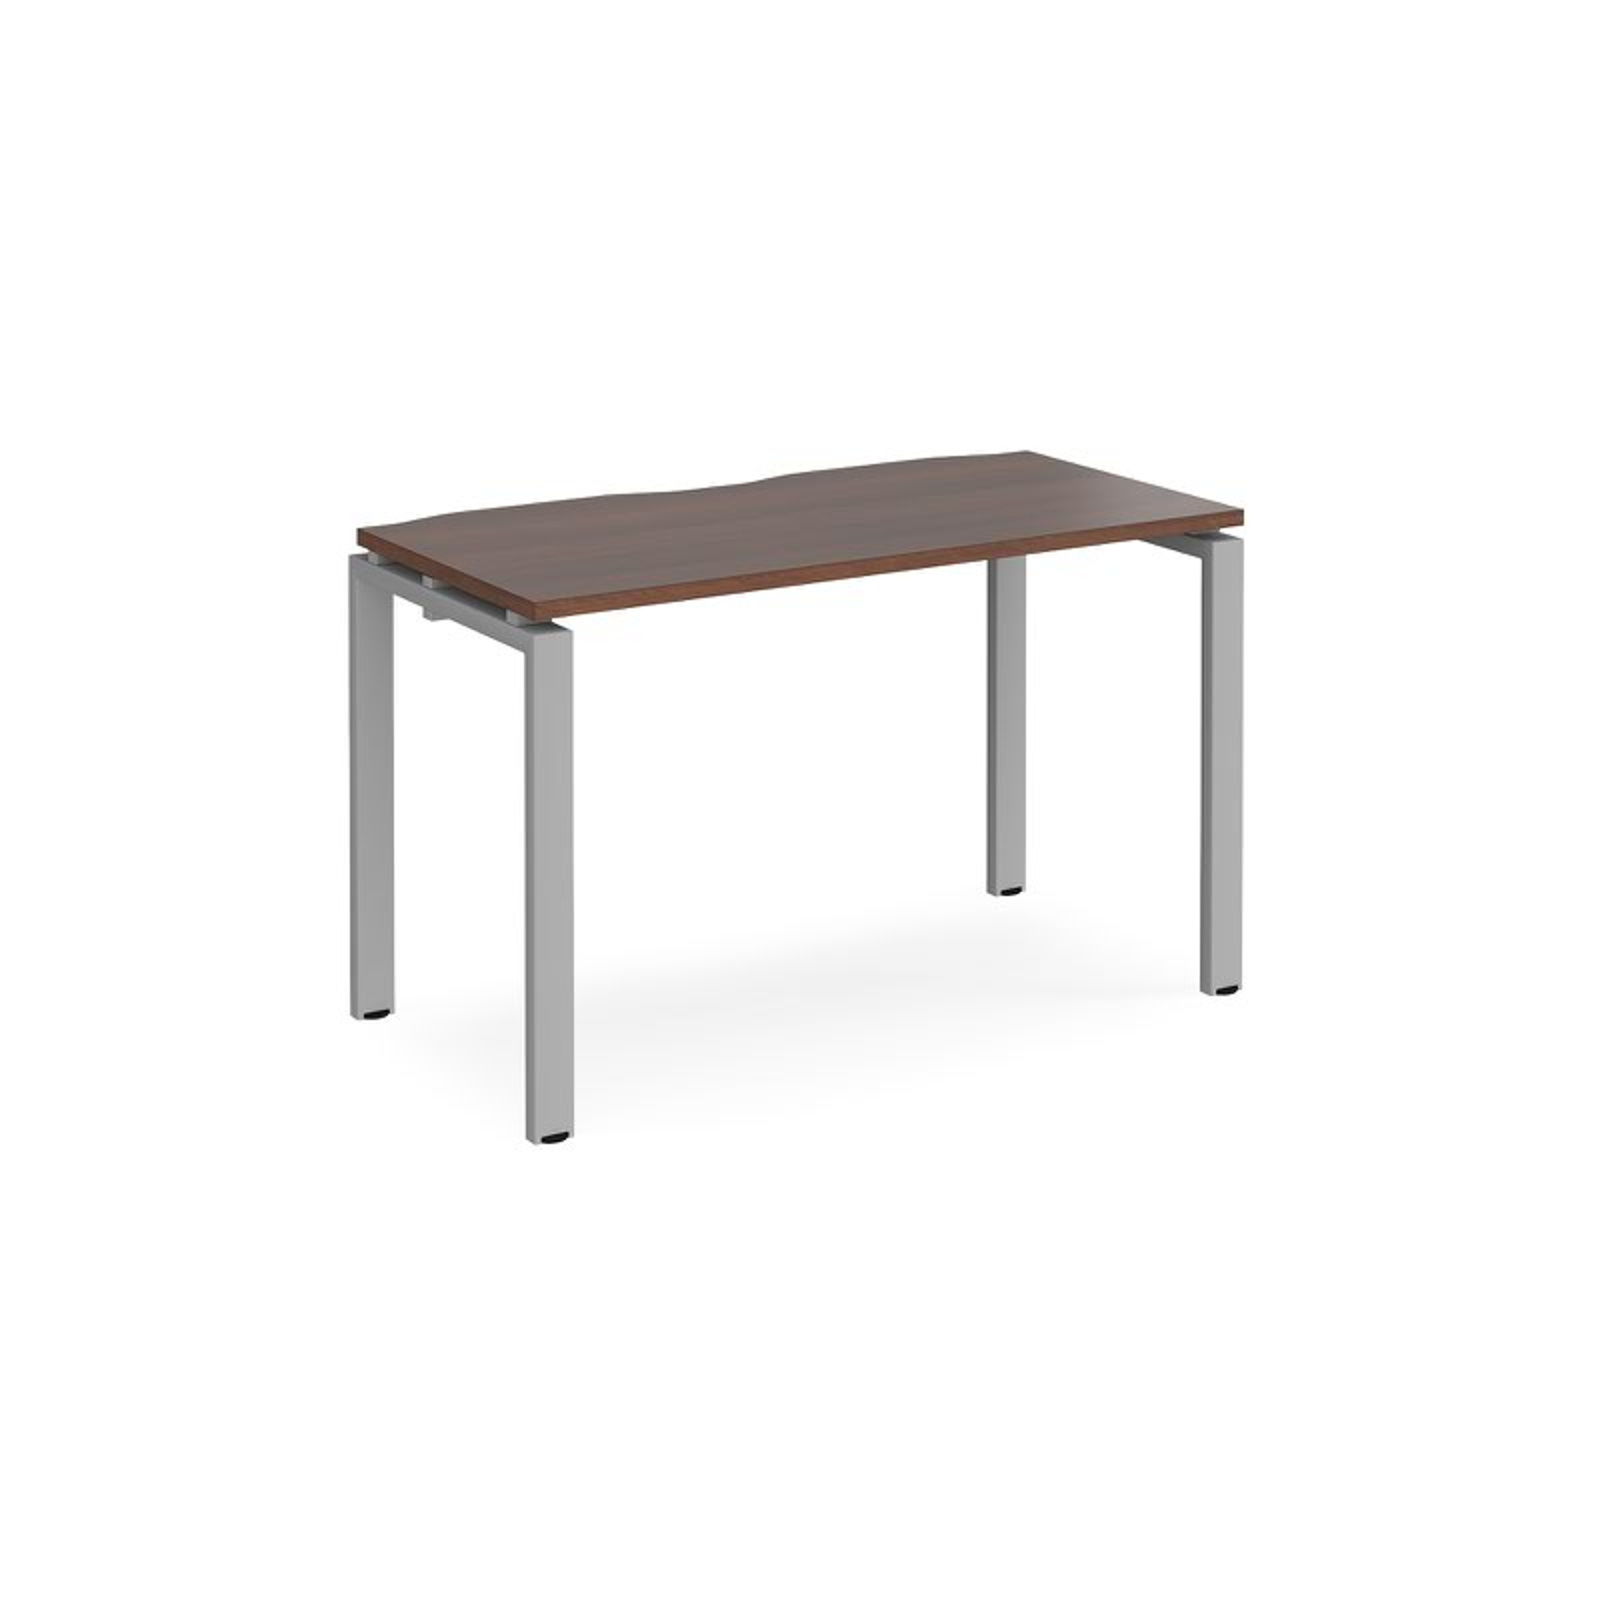 Image for Adapt II Bench System Starter Desk 1200x600mm Silver/Walnut